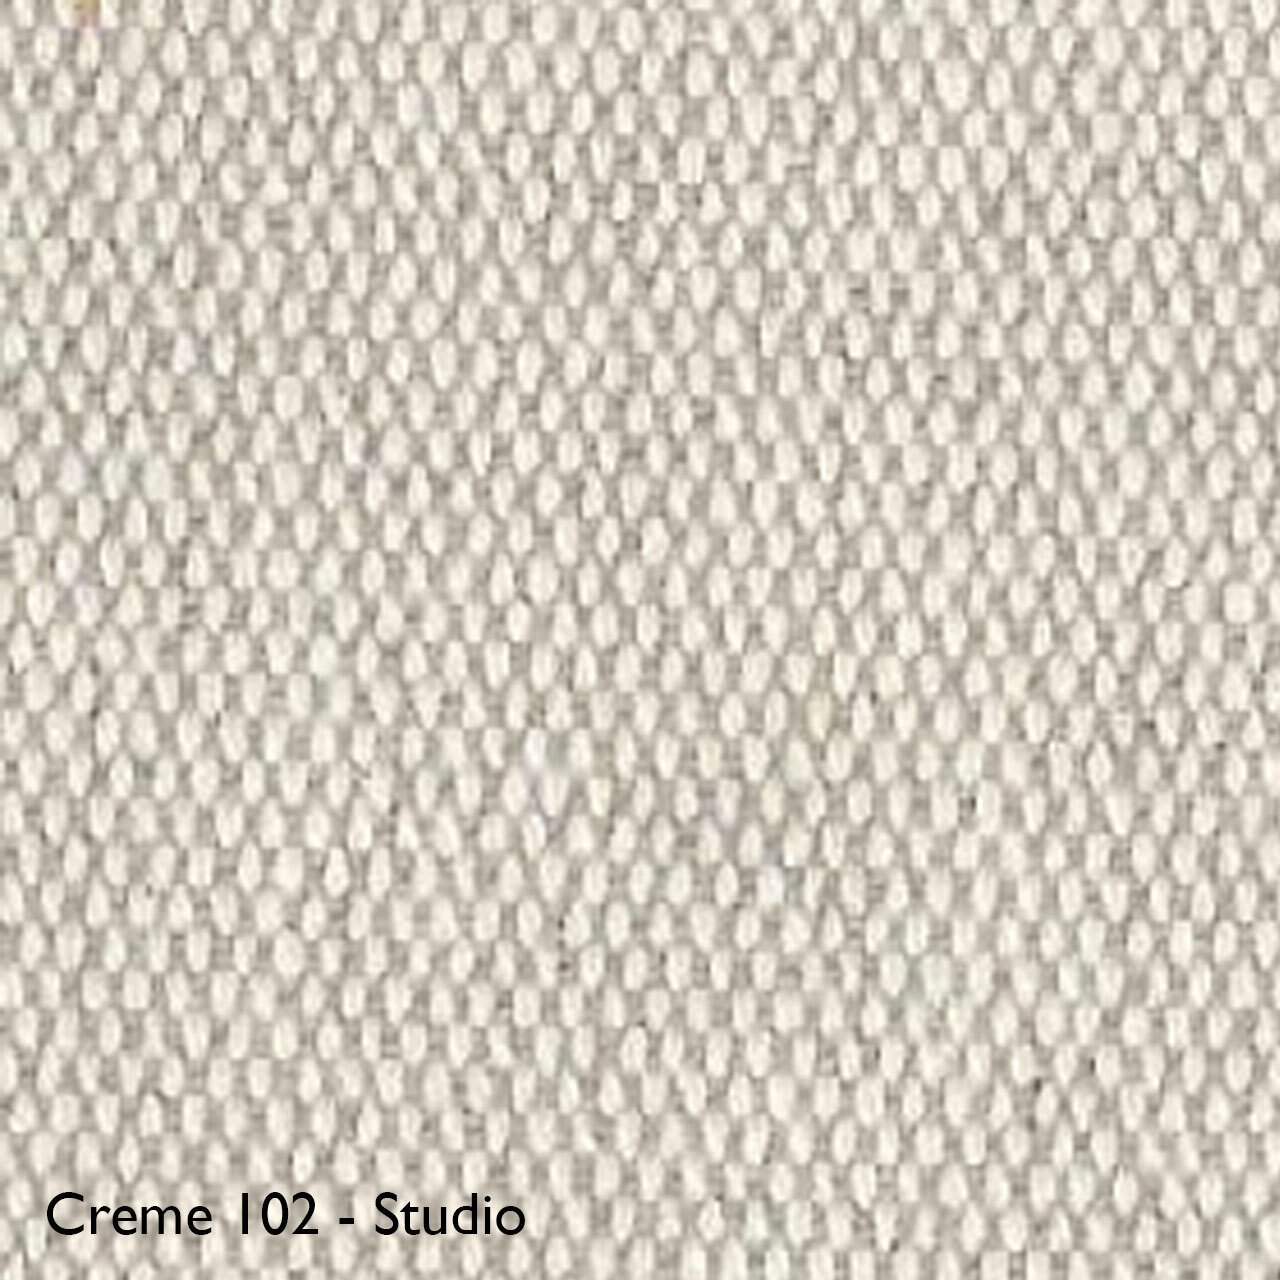 Farbkachel Blade Wendelbo Creme 102 - Studio